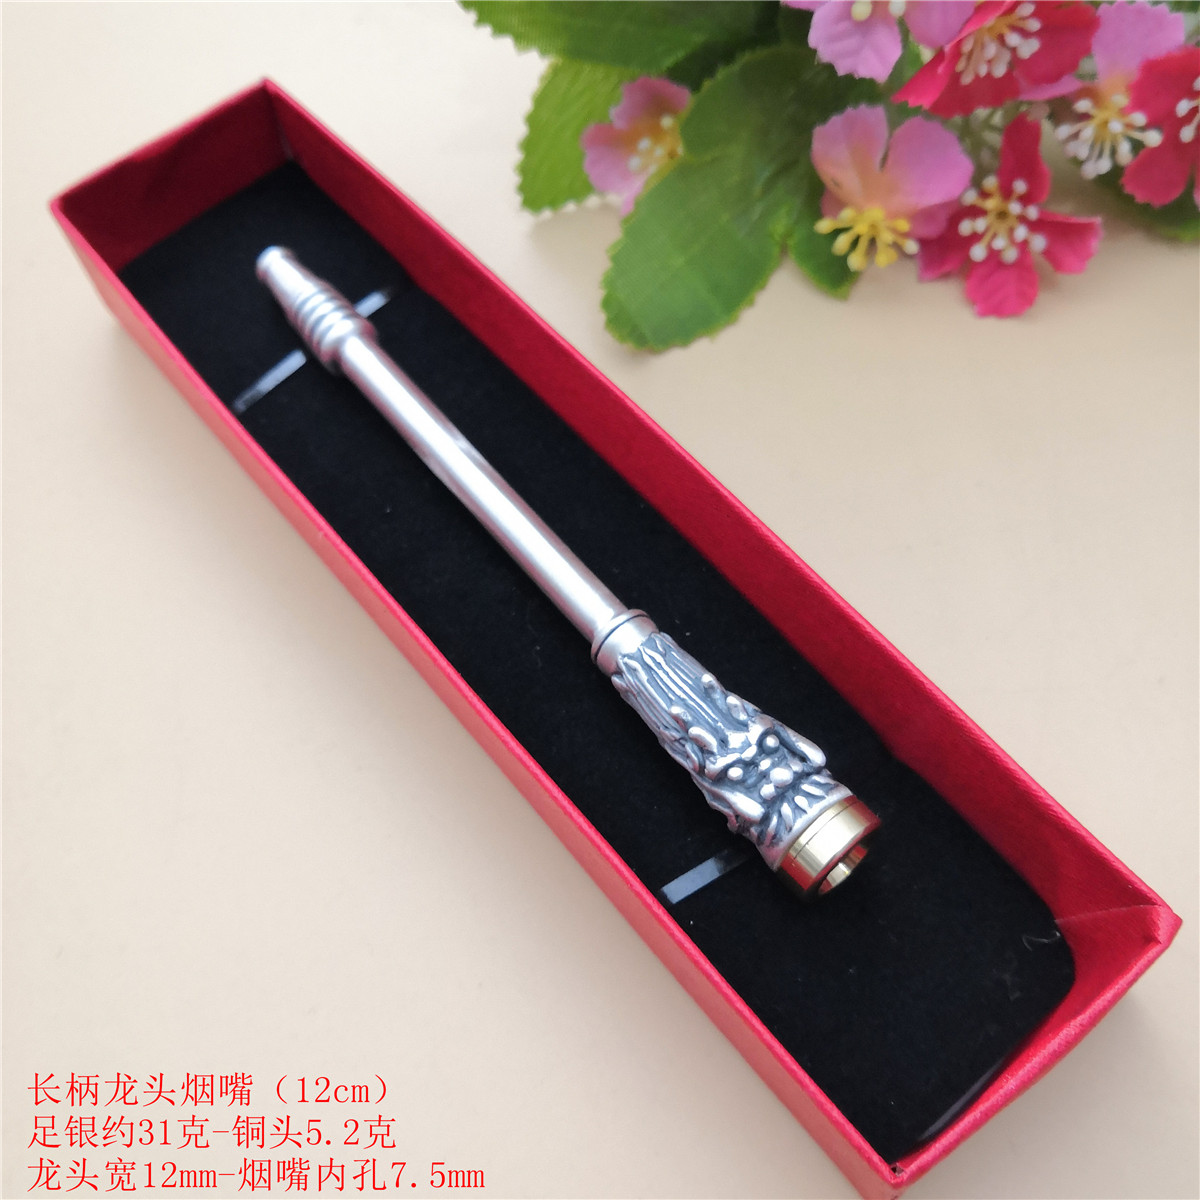 Image 5 - Pure Silver Xianglong Cigarette Holder With Filter Element  999  Silver Jewelry Cigarette Bag, Tap Cigarette, Pipe, MensCigarette  Accessories